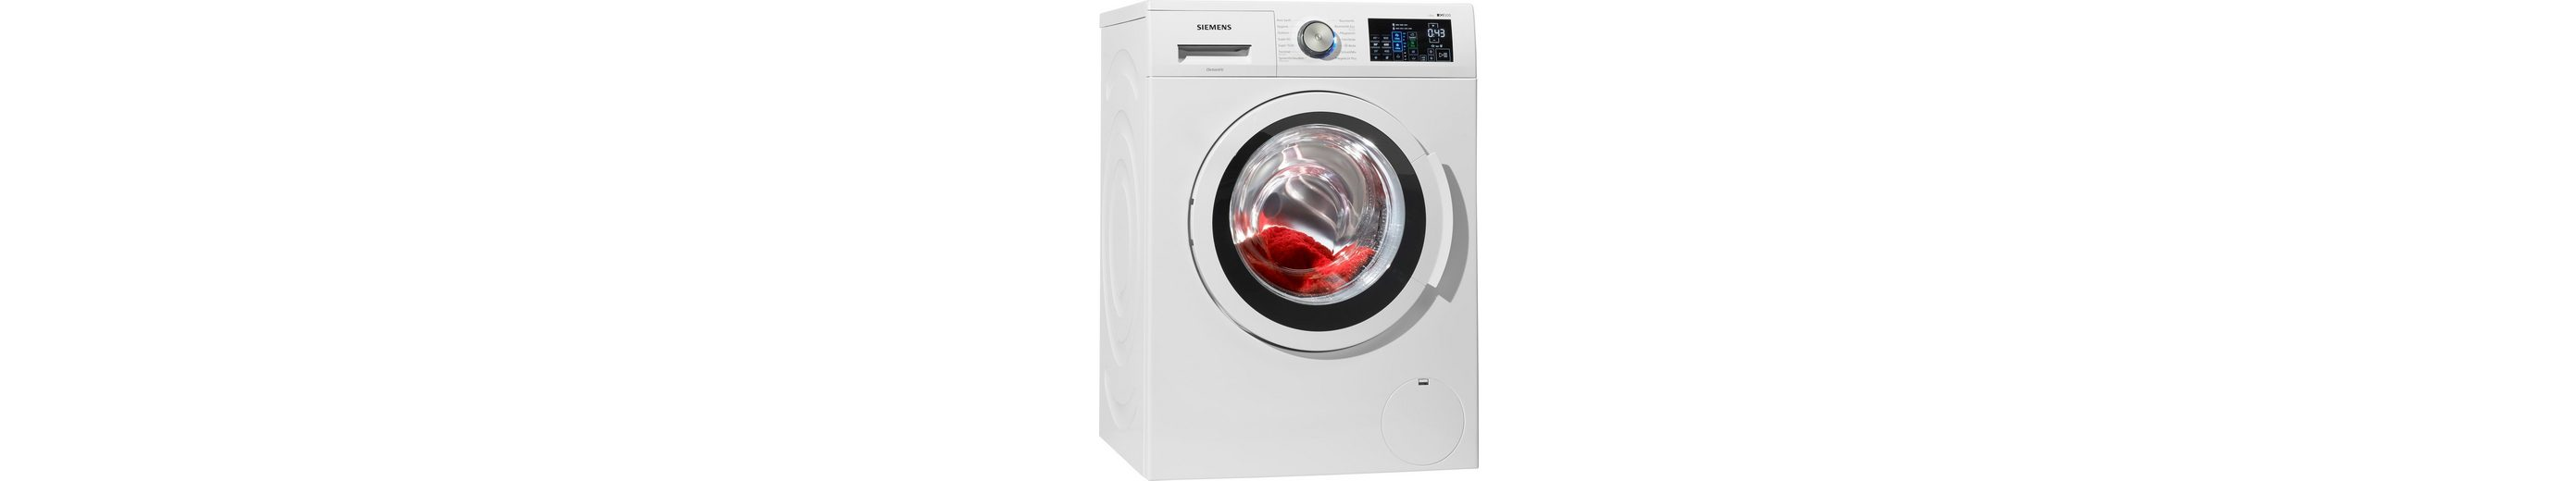 SIEMENS Waschmaschine WM14T640 i-Dos, A+++, 8 kg, 1400 U/Min